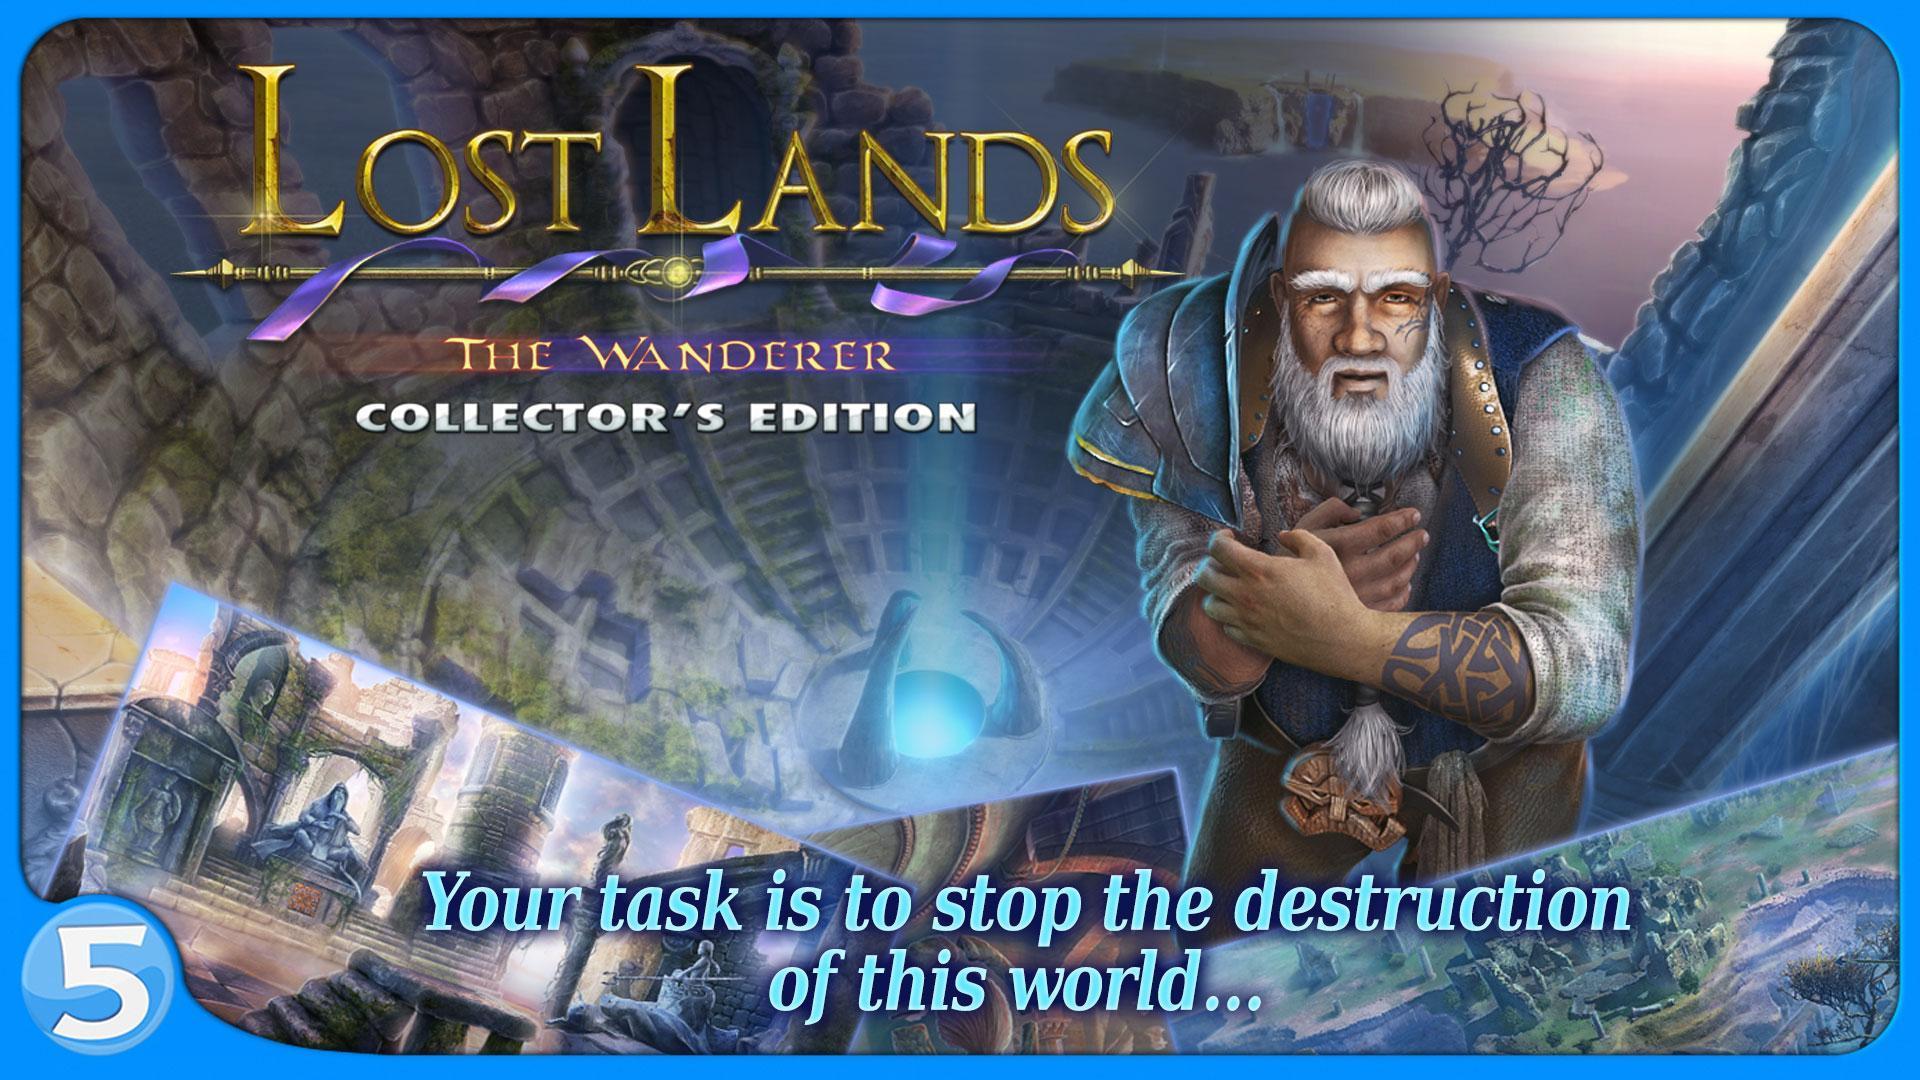 Lost Lands 4 poster